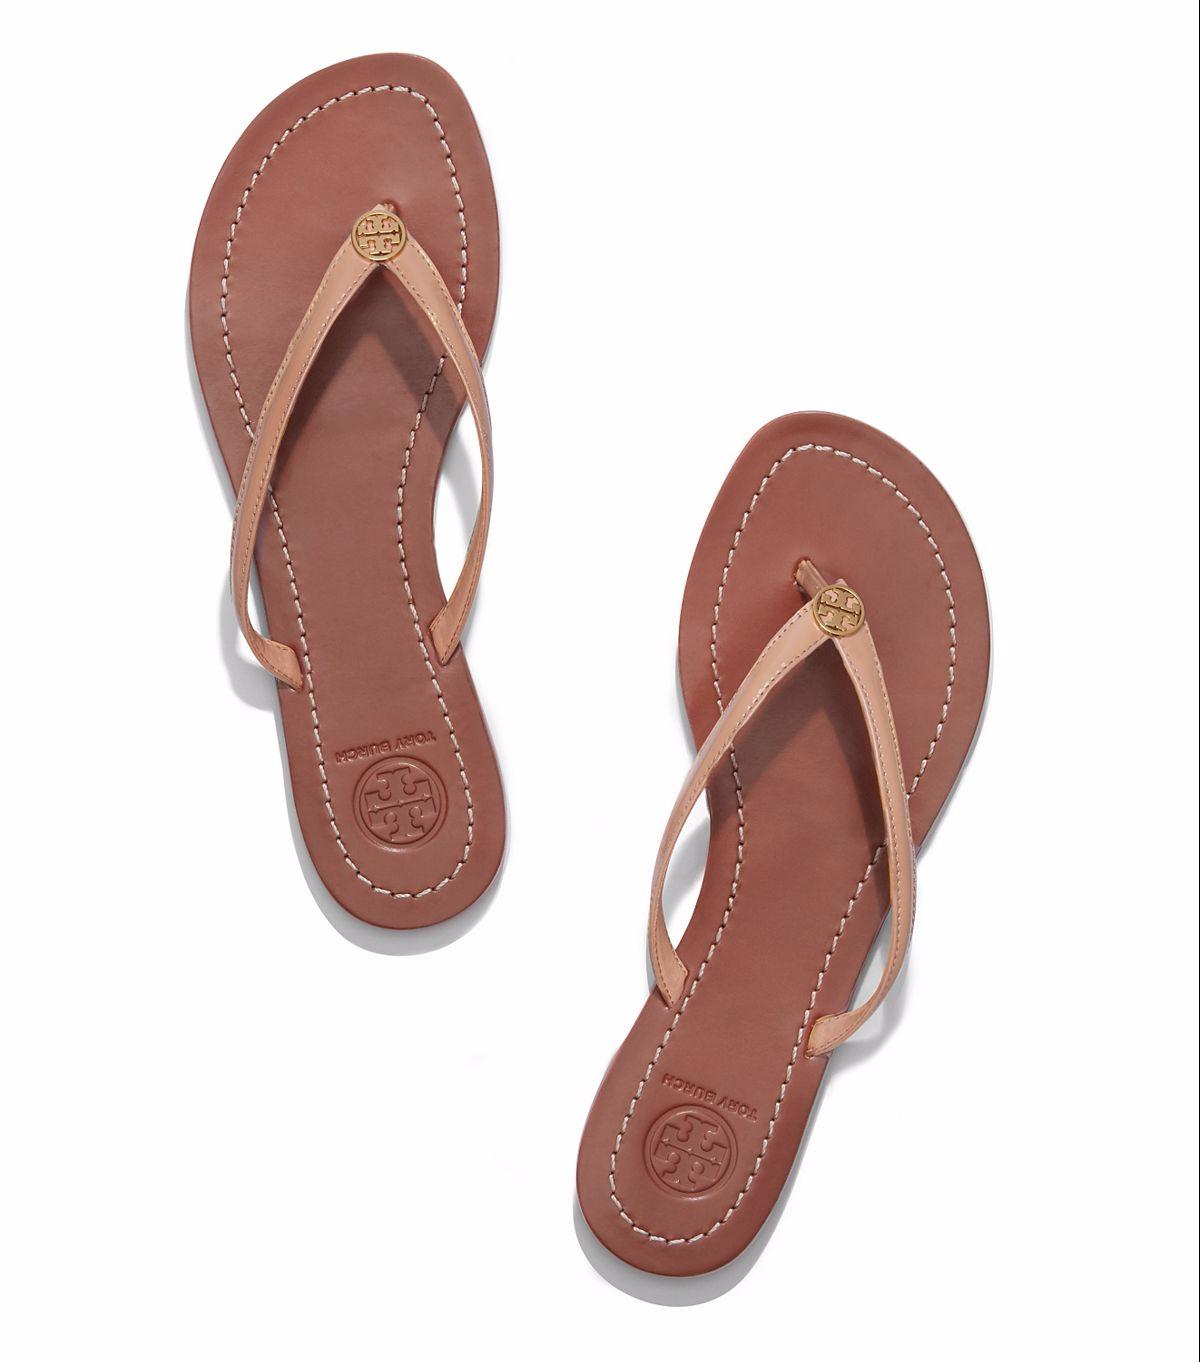 Terra Thong Sandal $125